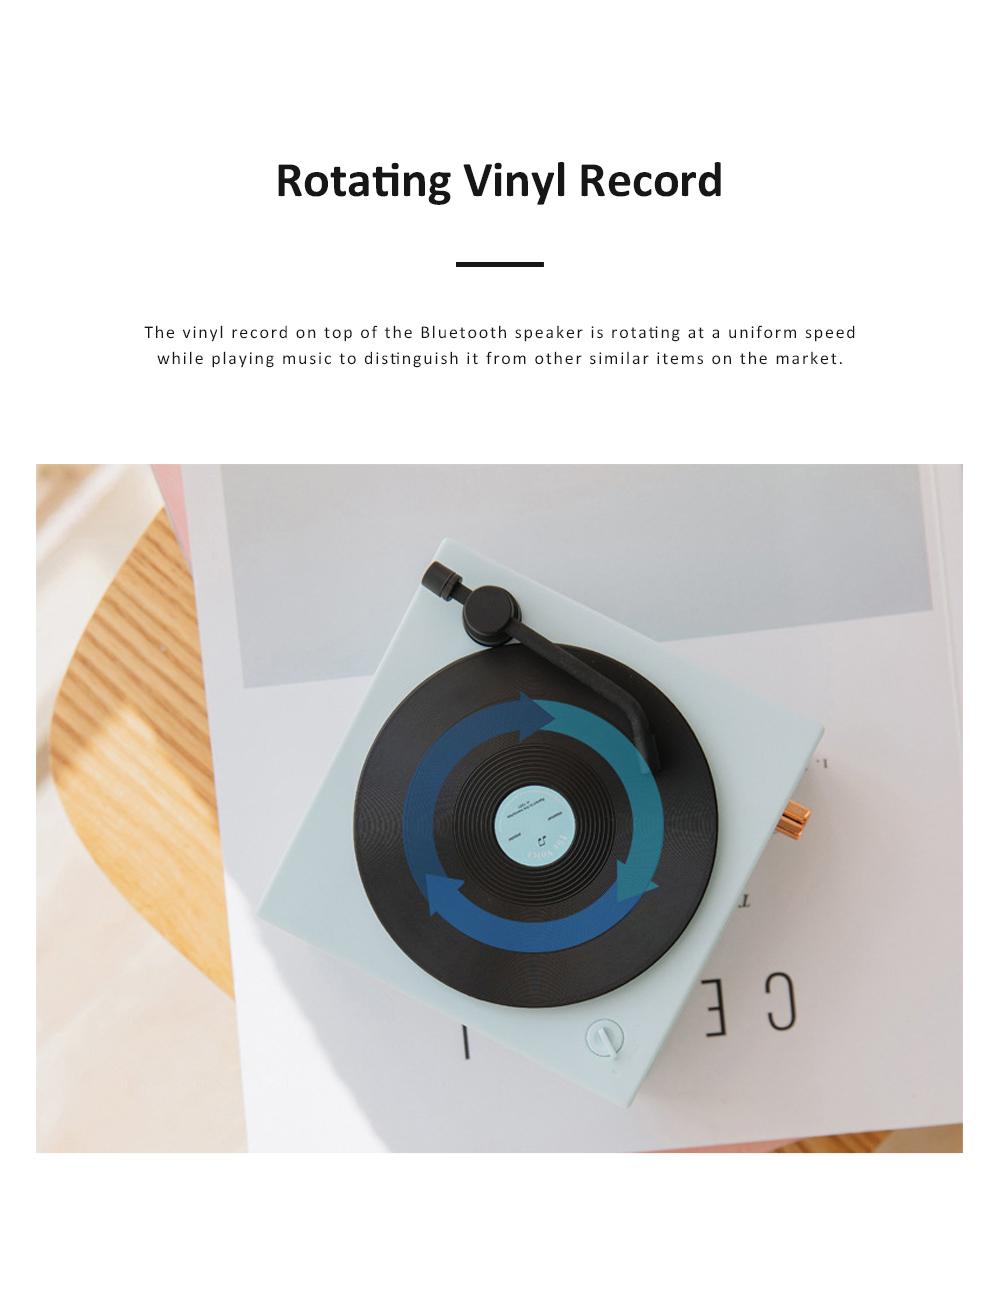 Retro Vinyl Record Bluetooth Speaker Wireless Mini Subwoofer Portable Loudspeaker Box USB Rechargeable Baffle Box Nice Christmas Birthday Present 3